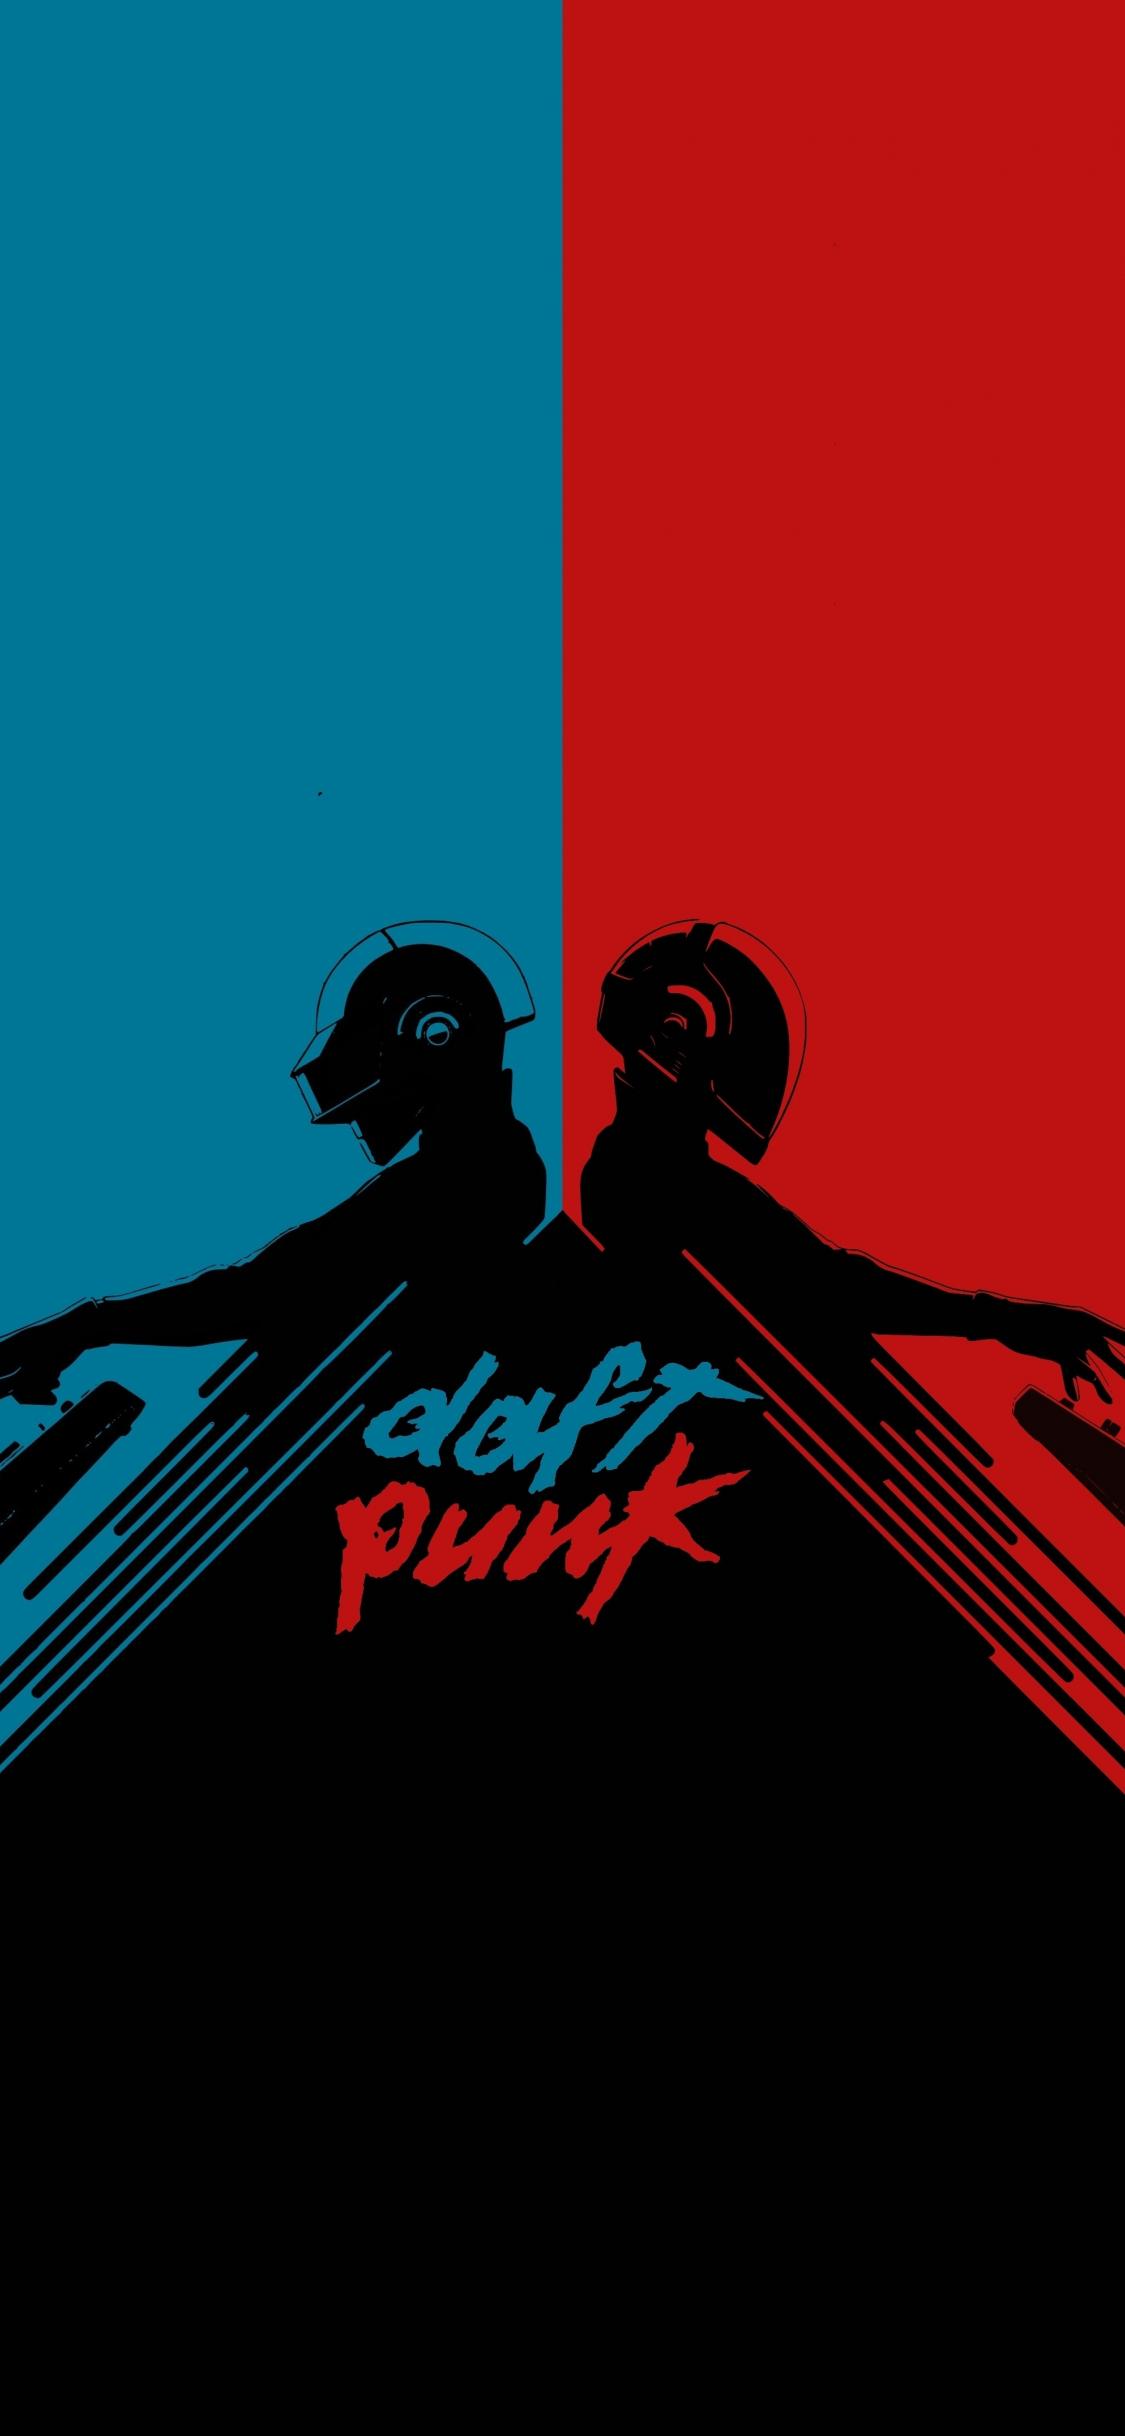 Download 1125x2436 Wallpaper Daft Punk Musician Minimal